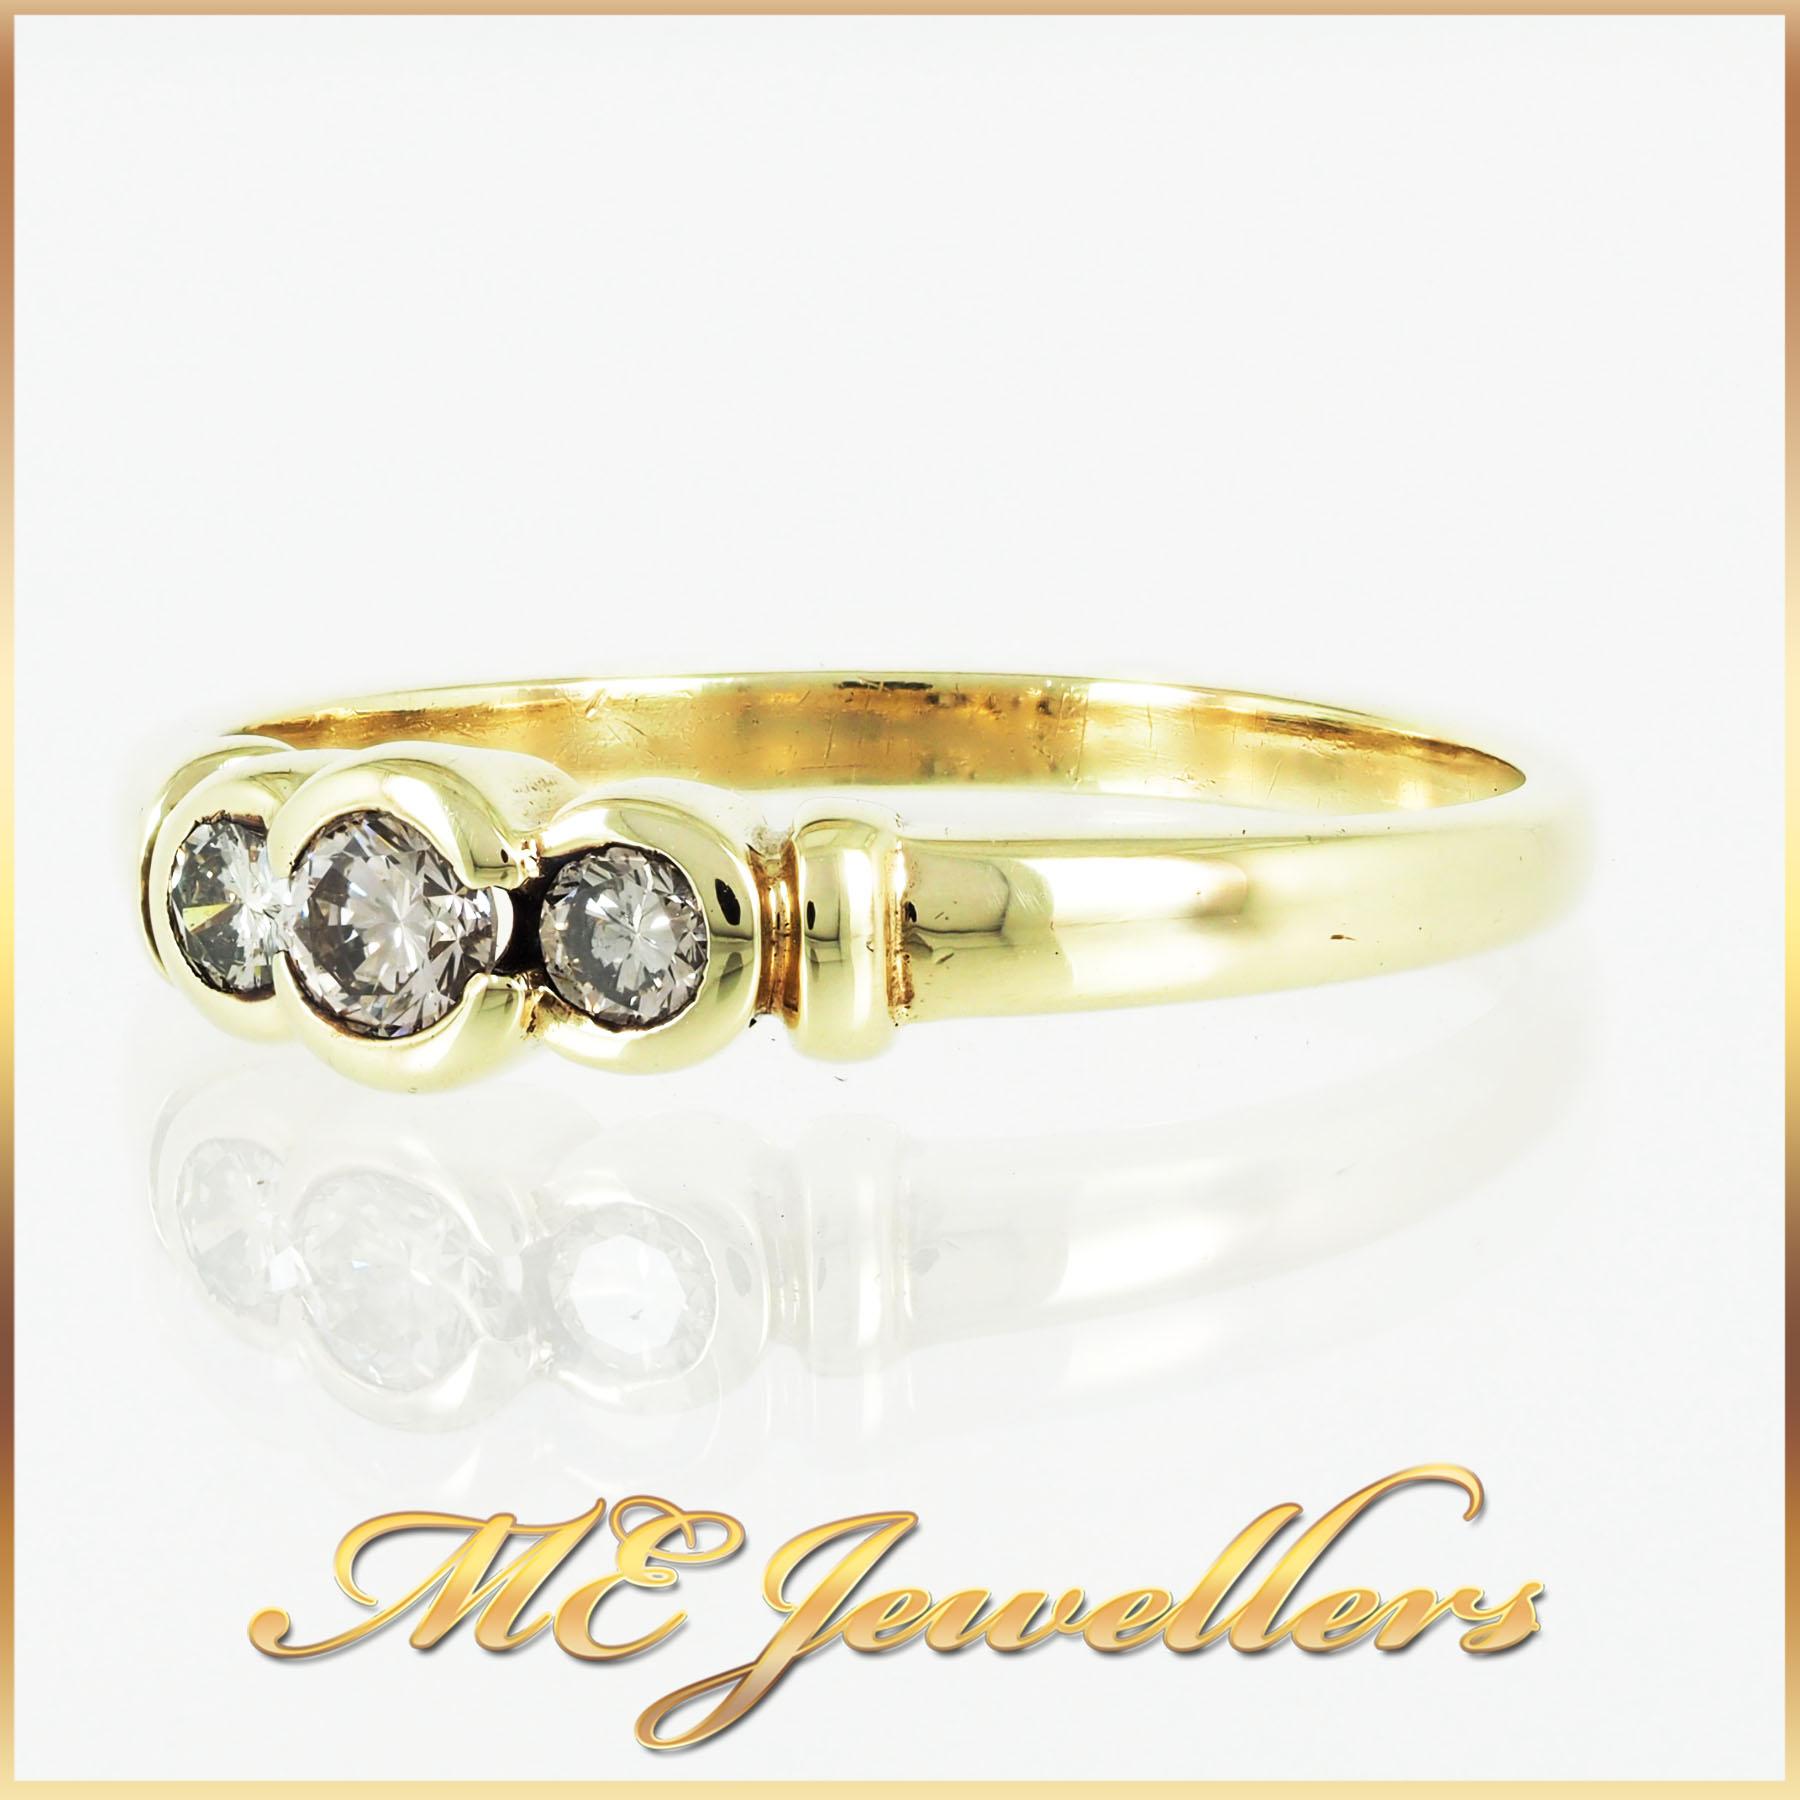 313 Trilogy Diamond Ring 9K Yellow Gold (4)